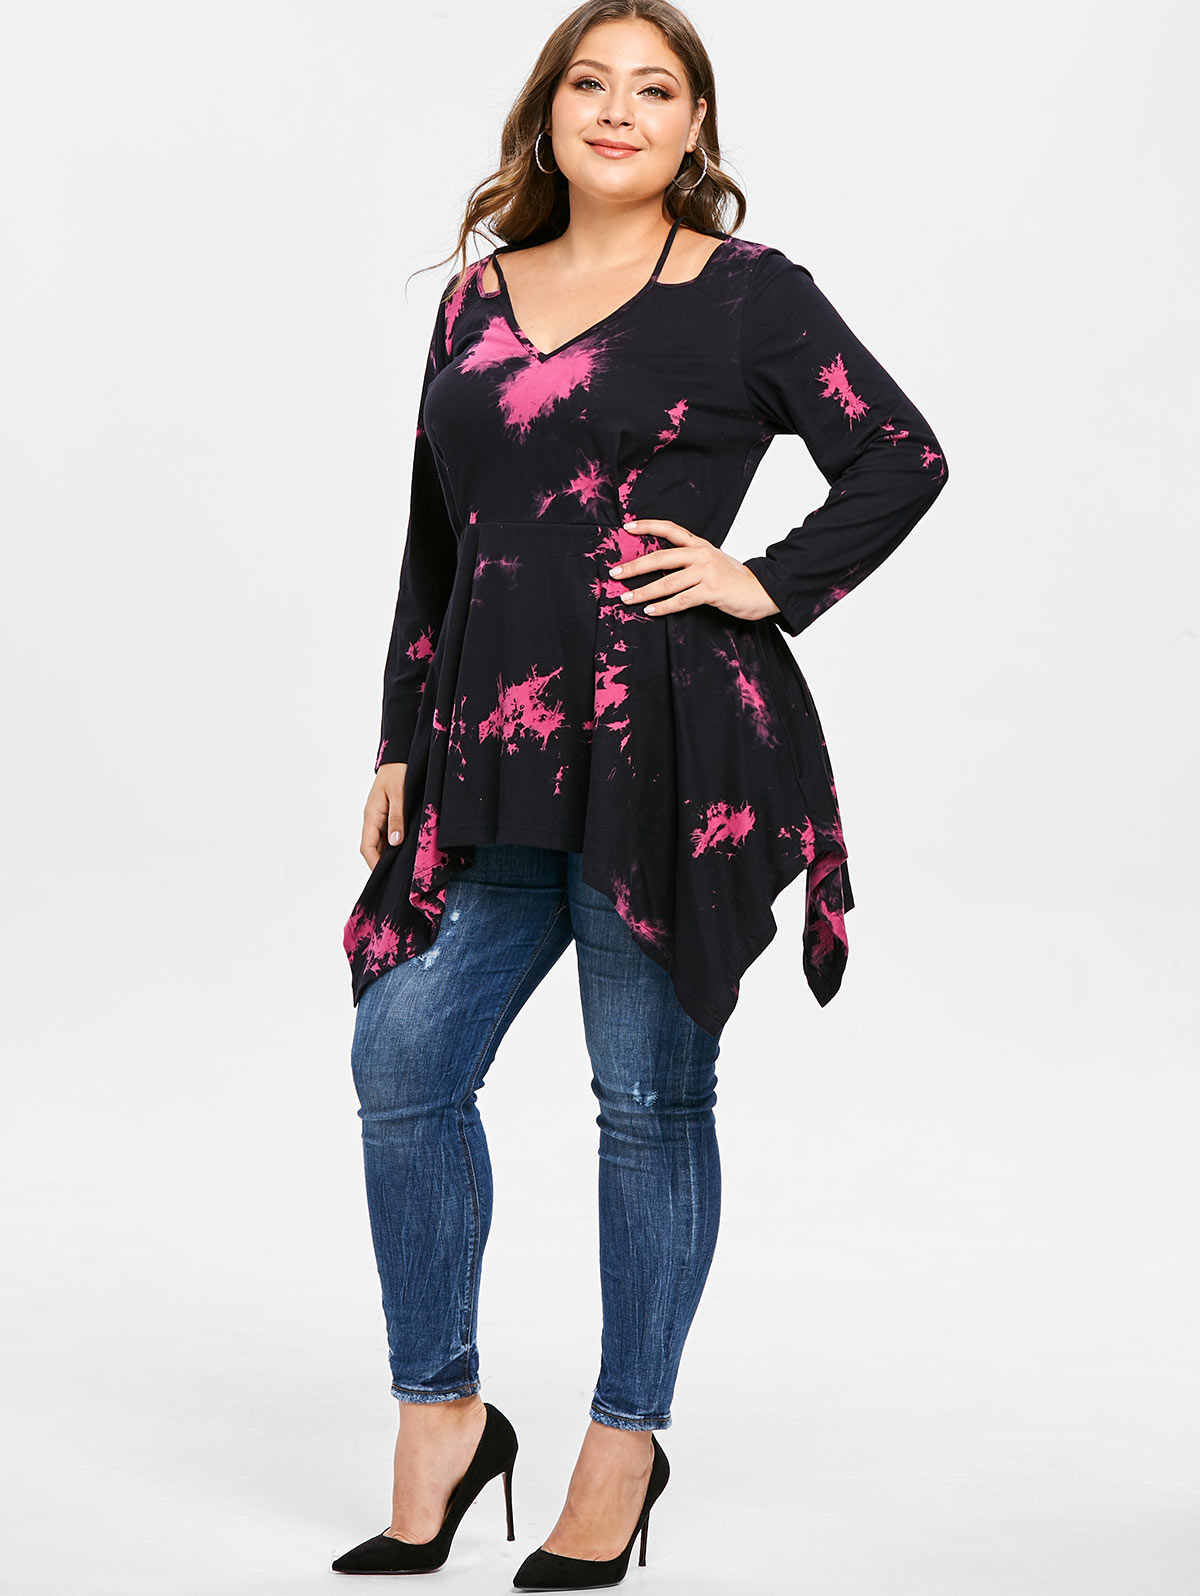 Gamiss Plus Ukuran Wanita T-shirt Jatuh Potongan Tie Dye Saputangan Tunik T Kemeja Kasual Leher V Lengan Panjang Asimetris Tops tees